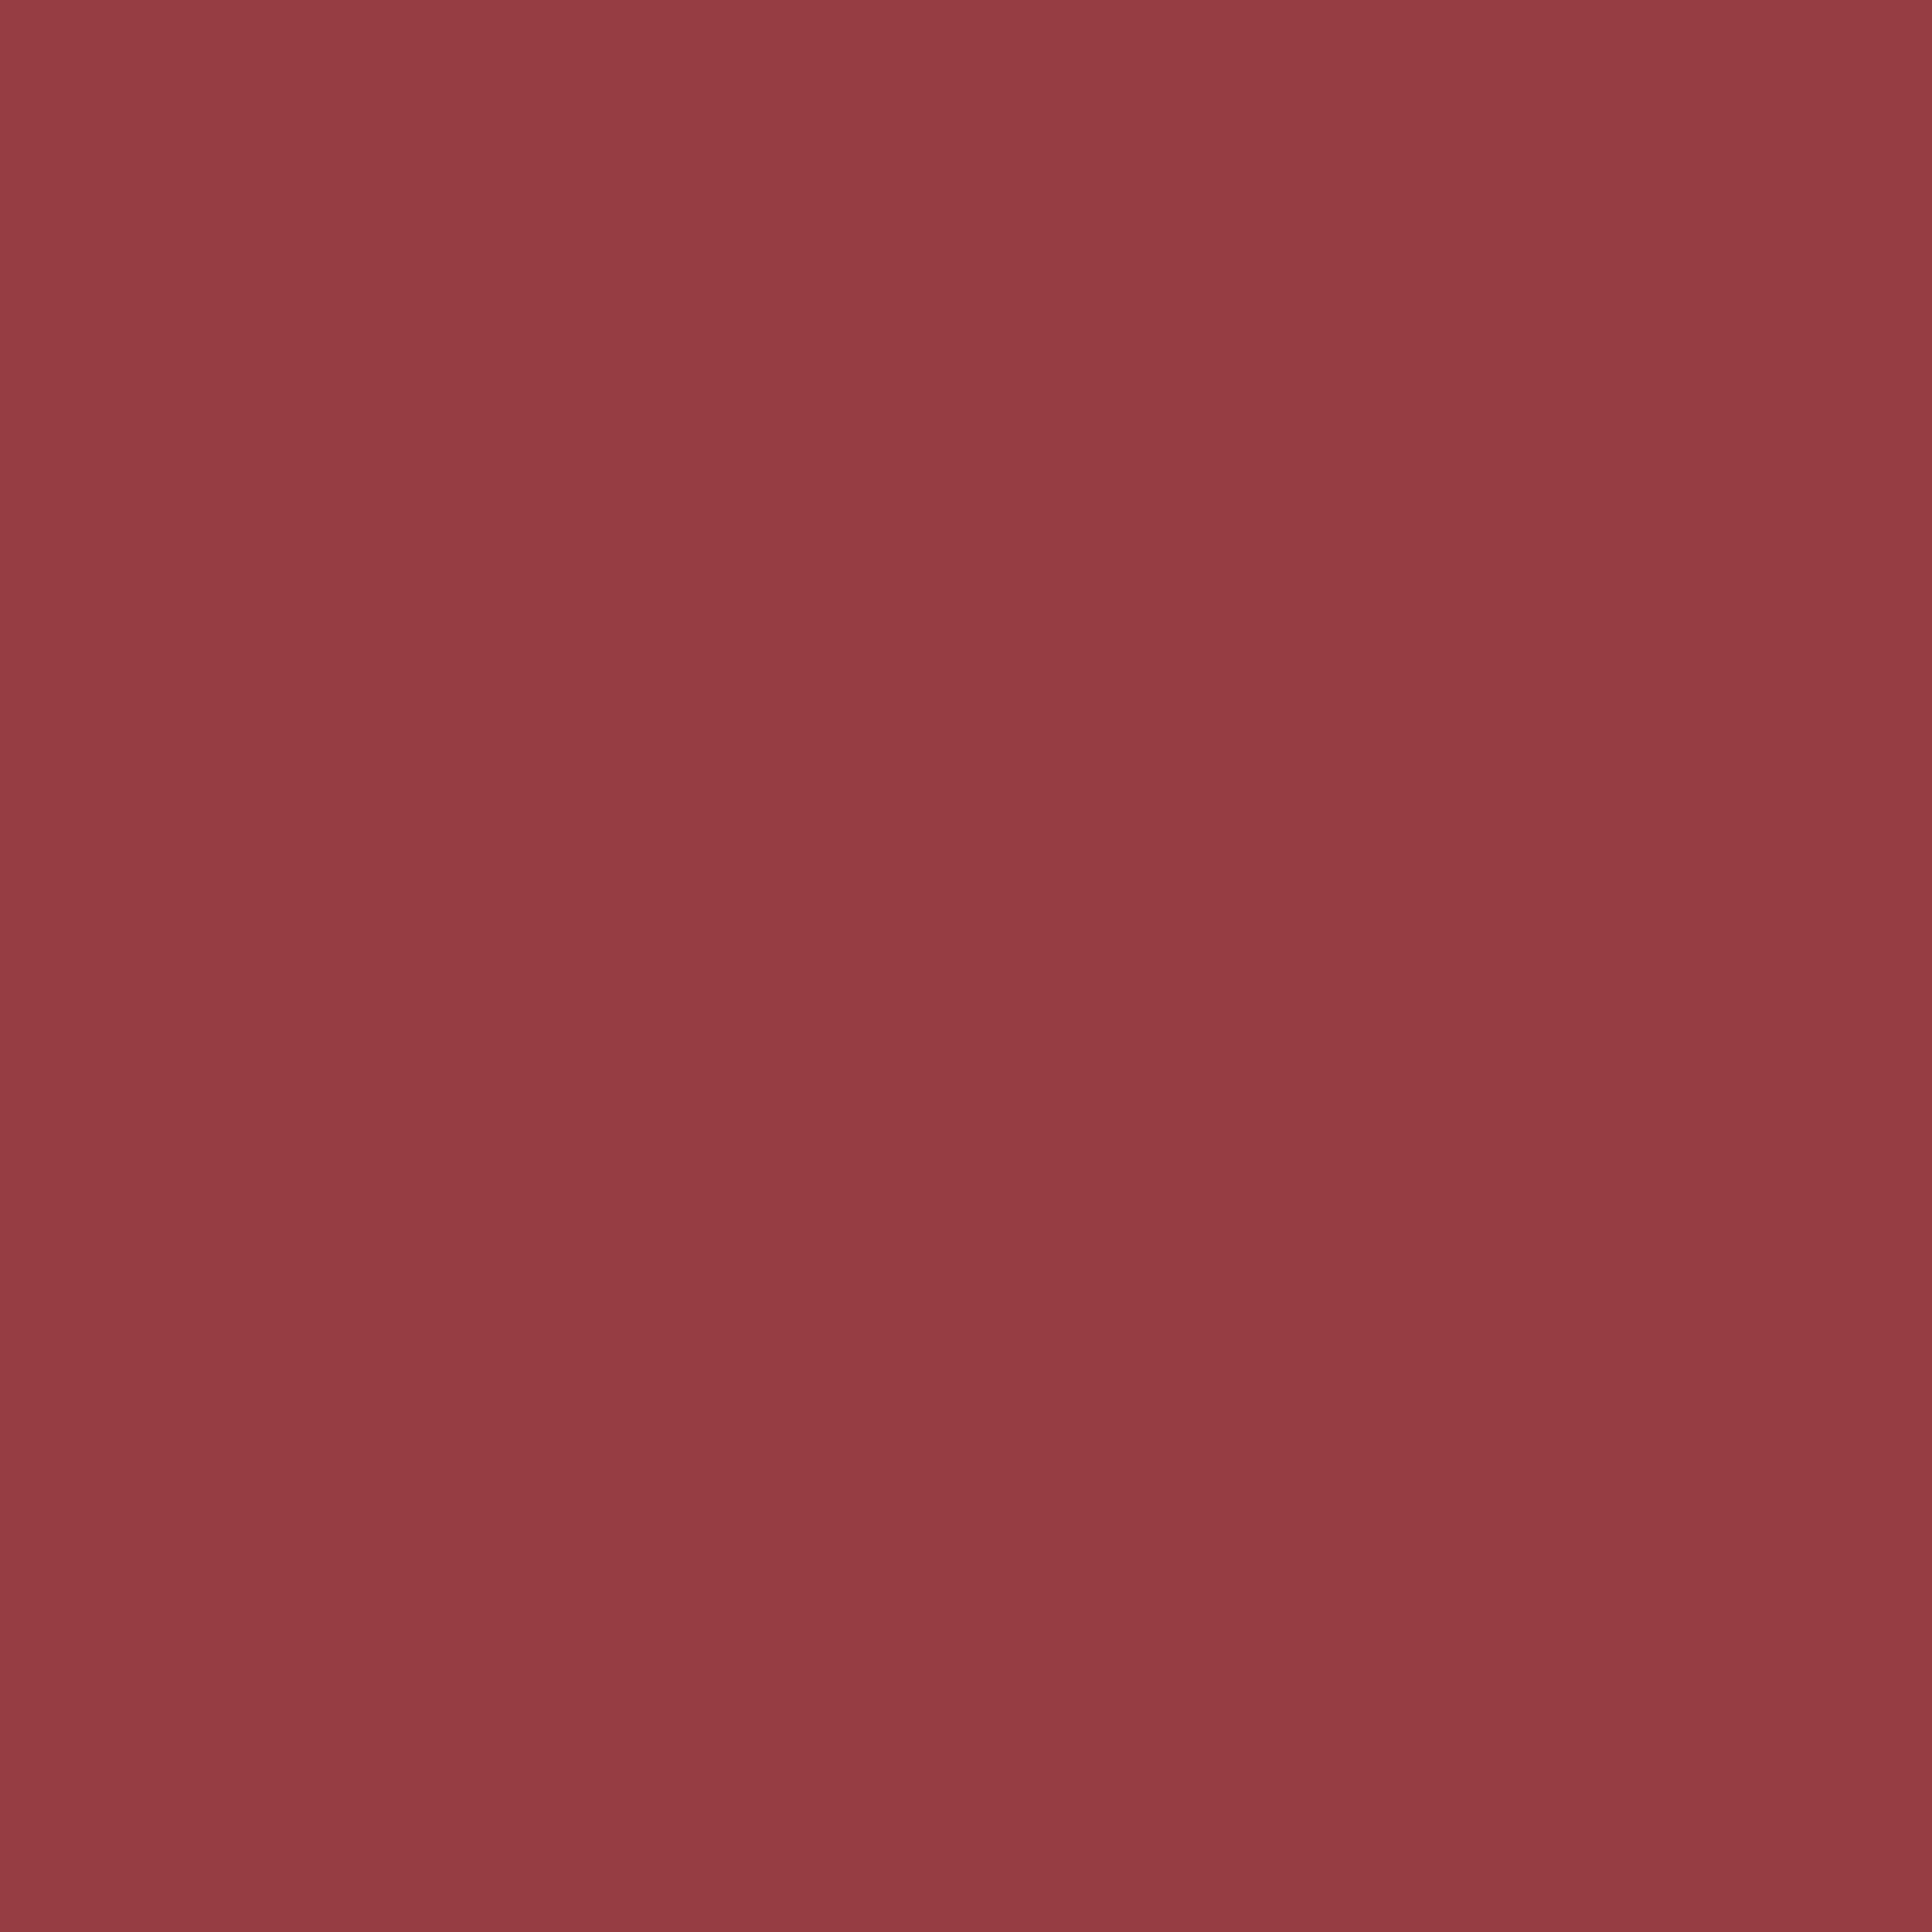 2732x2732 Smokey Topaz Solid Color Background